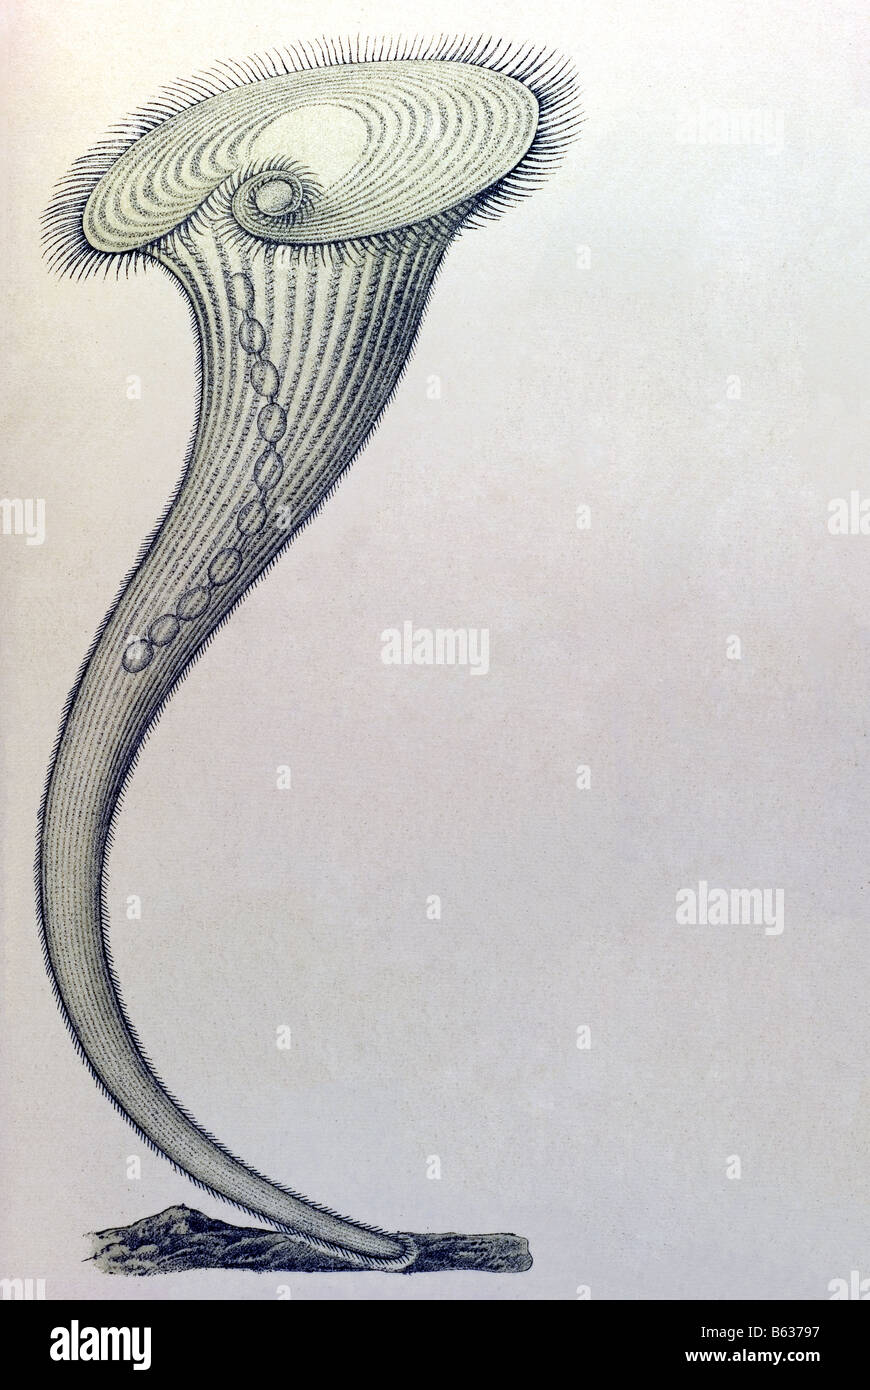 Ciliata / Wimperlinge, Name Stentor, Haeckel, Kunstformen der Natur, art nouveau, 20th century, Europe Stock Foto